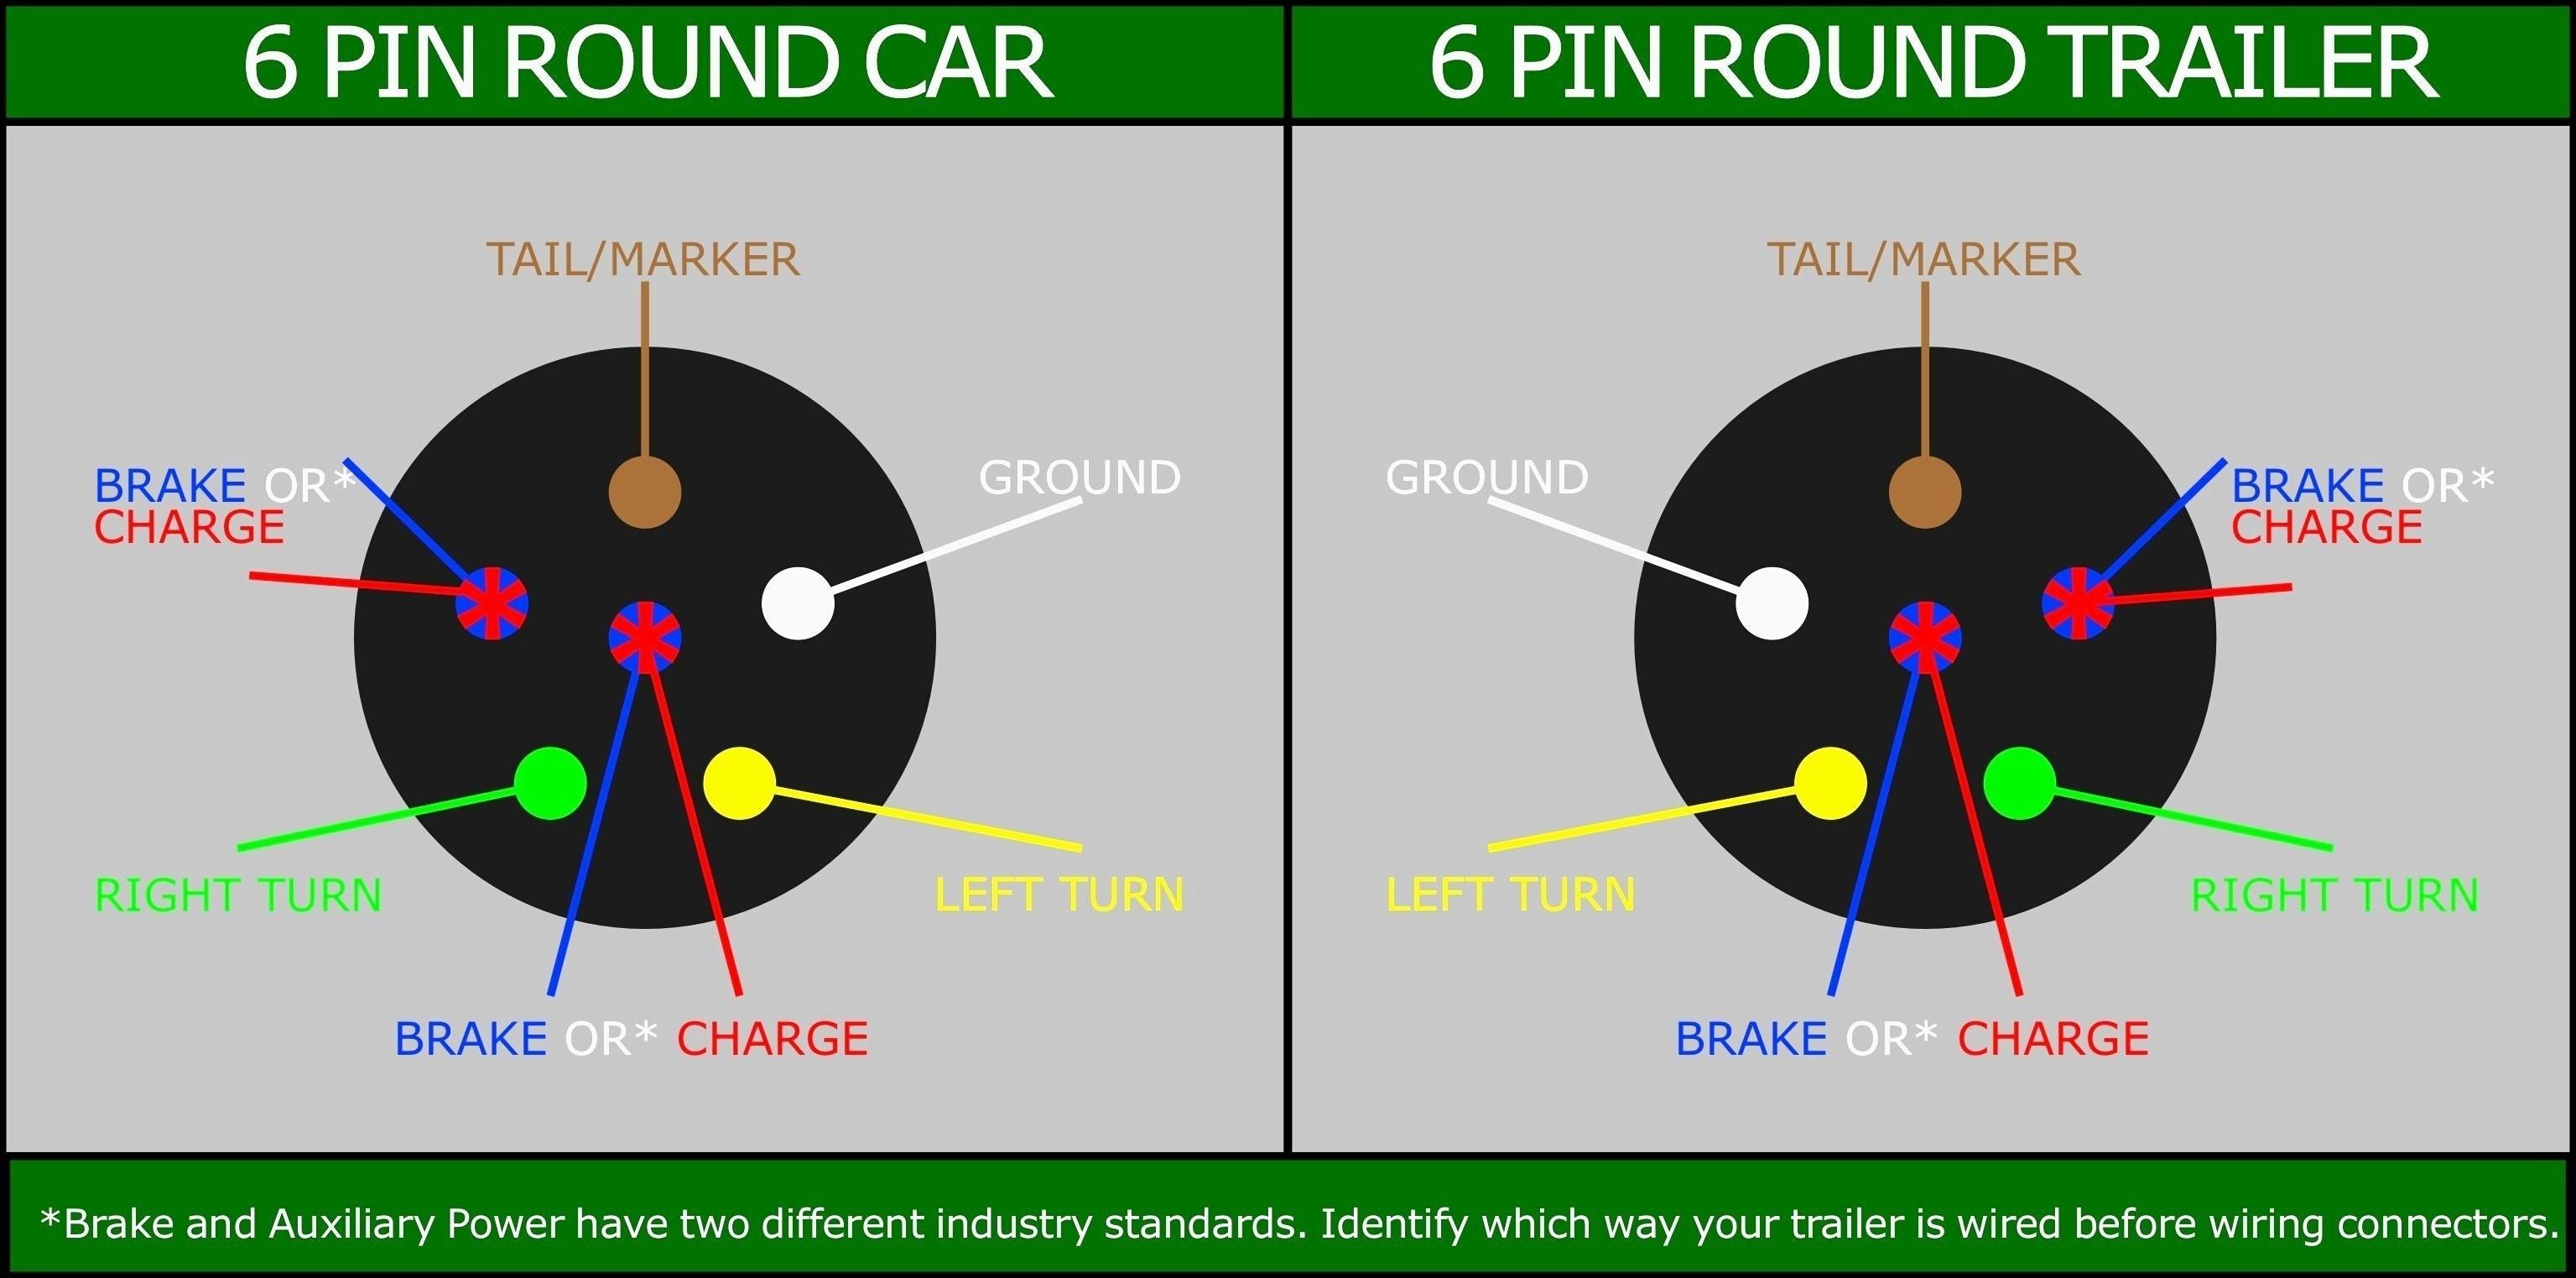 Trailer Lights Wiring Diagram 7 Pin Wiring Diagram for 7 Way Trailer Plug Electrical Circuit 7 Blade Of Trailer Lights Wiring Diagram 7 Pin